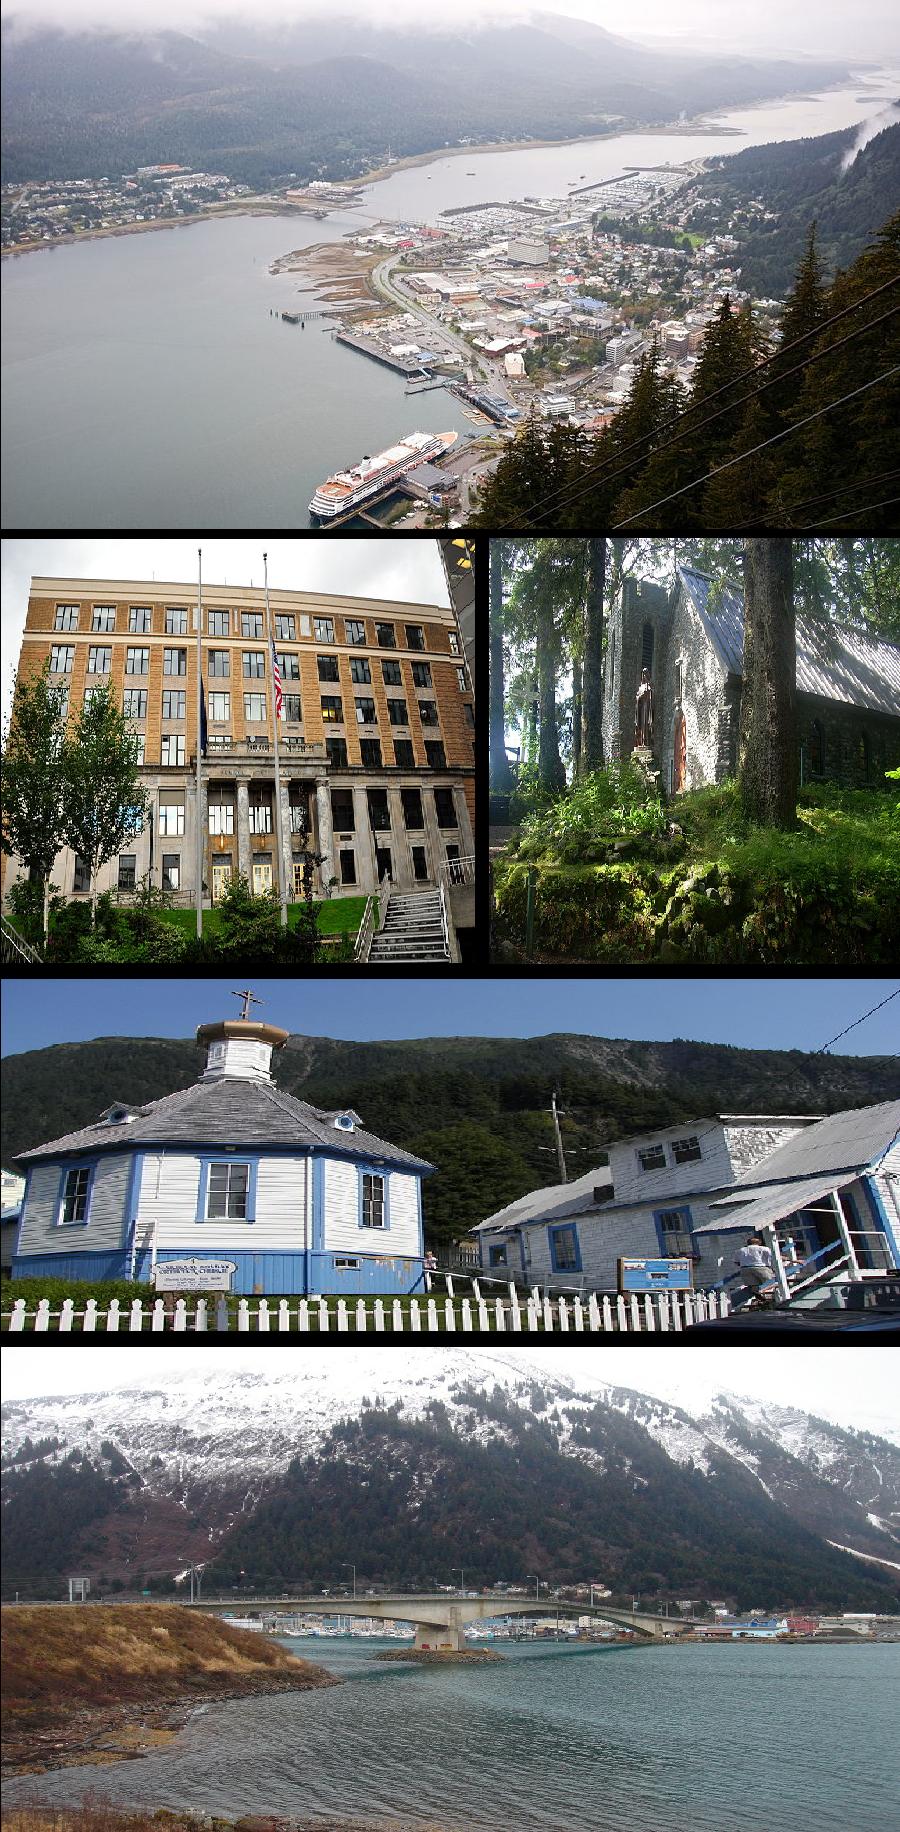 Clockwise from top: Downtown, Shrine of St. Therese, St. Nicholas Russian Orthodox Church, Juneau-Douglas Bridge, Alaska State Capitol